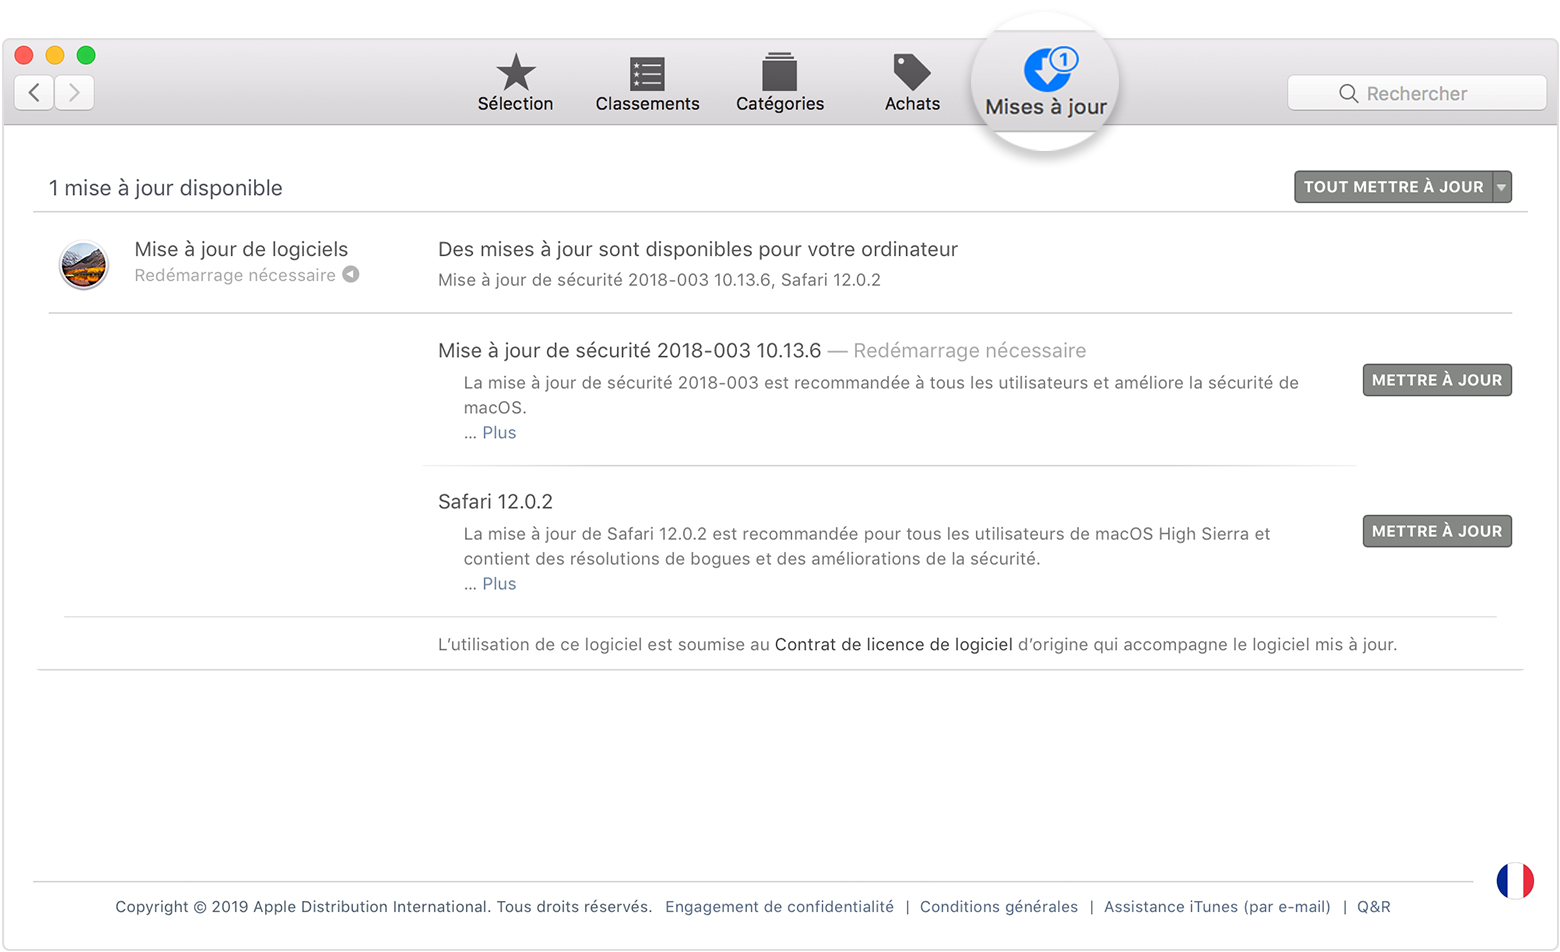 telecharger apple safari derniere version